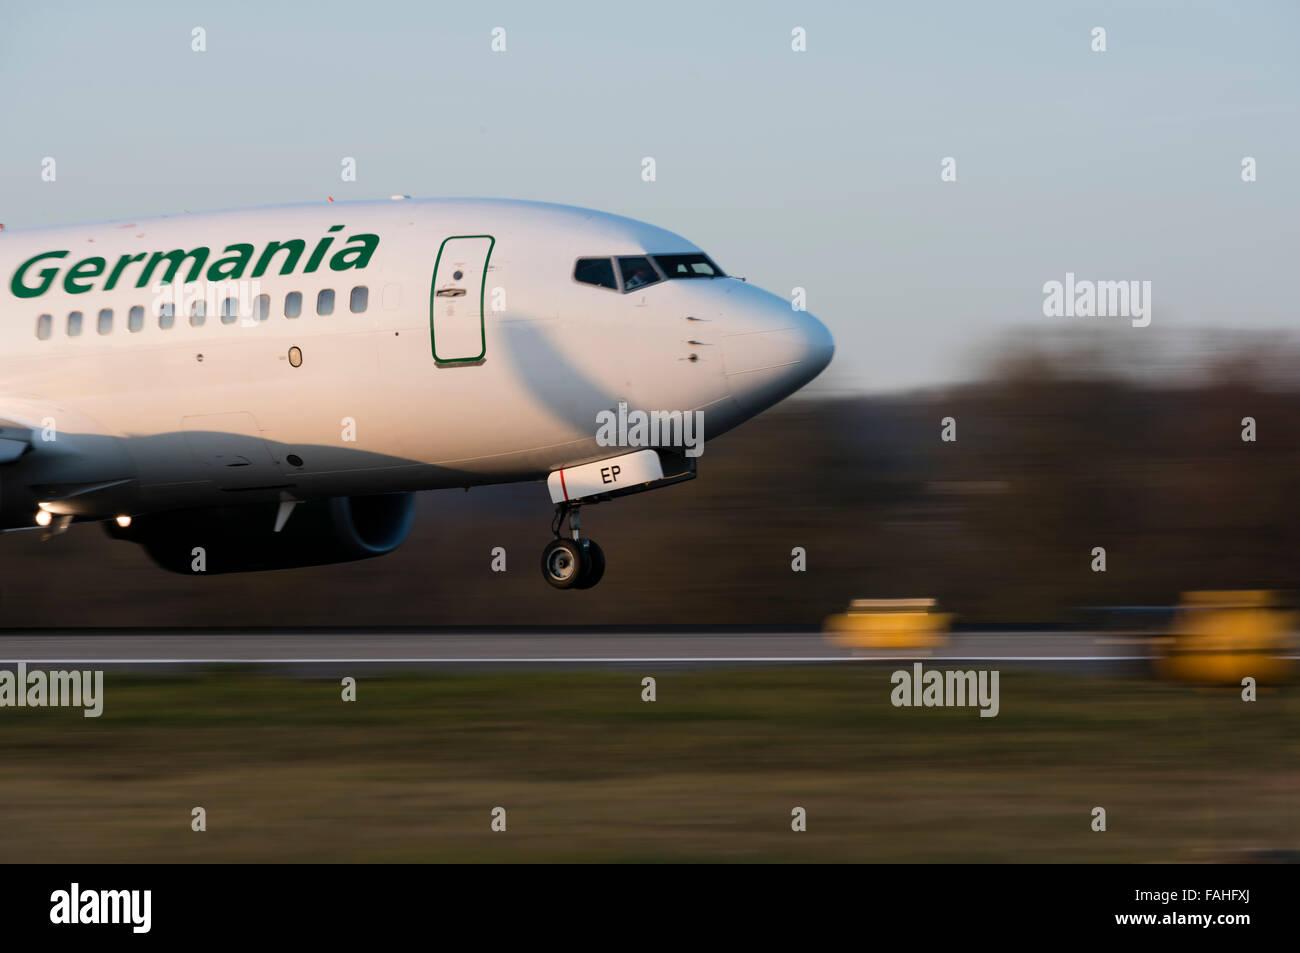 Landing Boeing 737 passenger aircraft of Germania airline at Zurich Kloten airport. - Stock Image